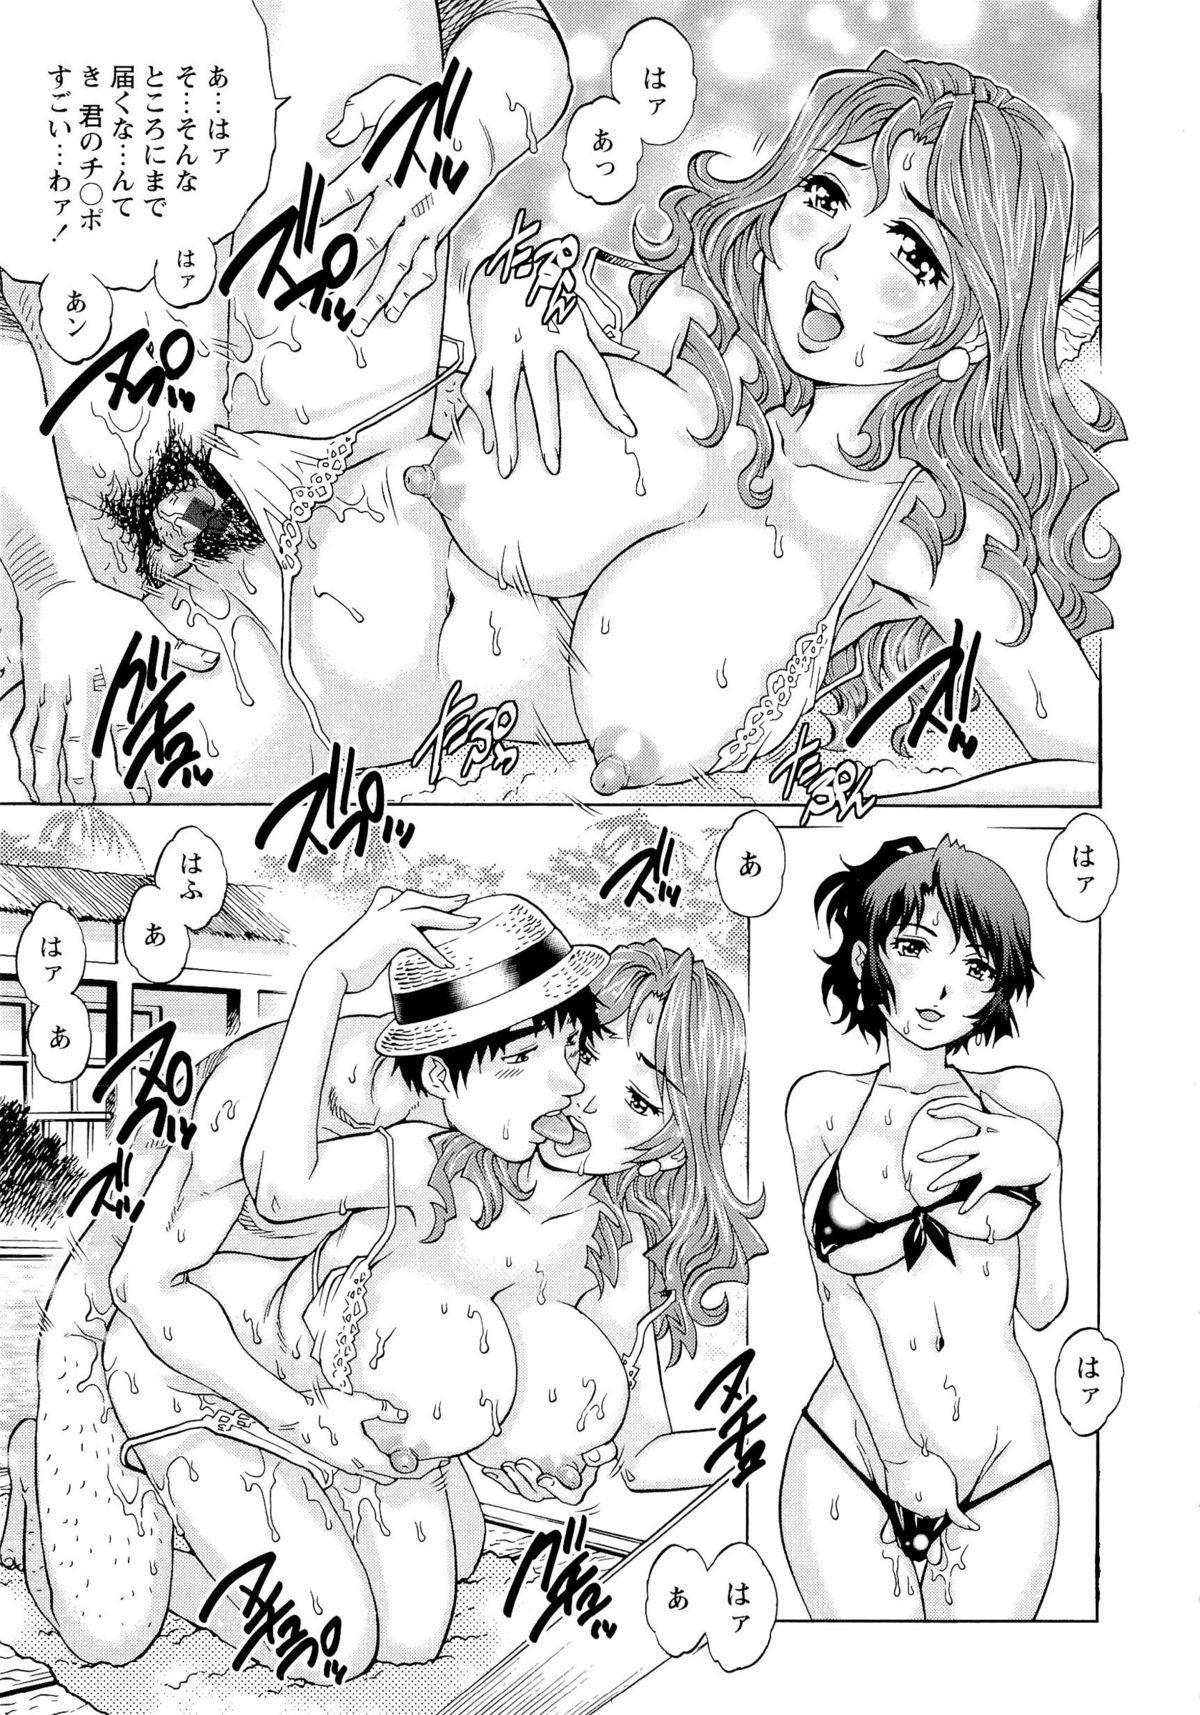 Nureteru Hitozuma - Wetly Wife 141